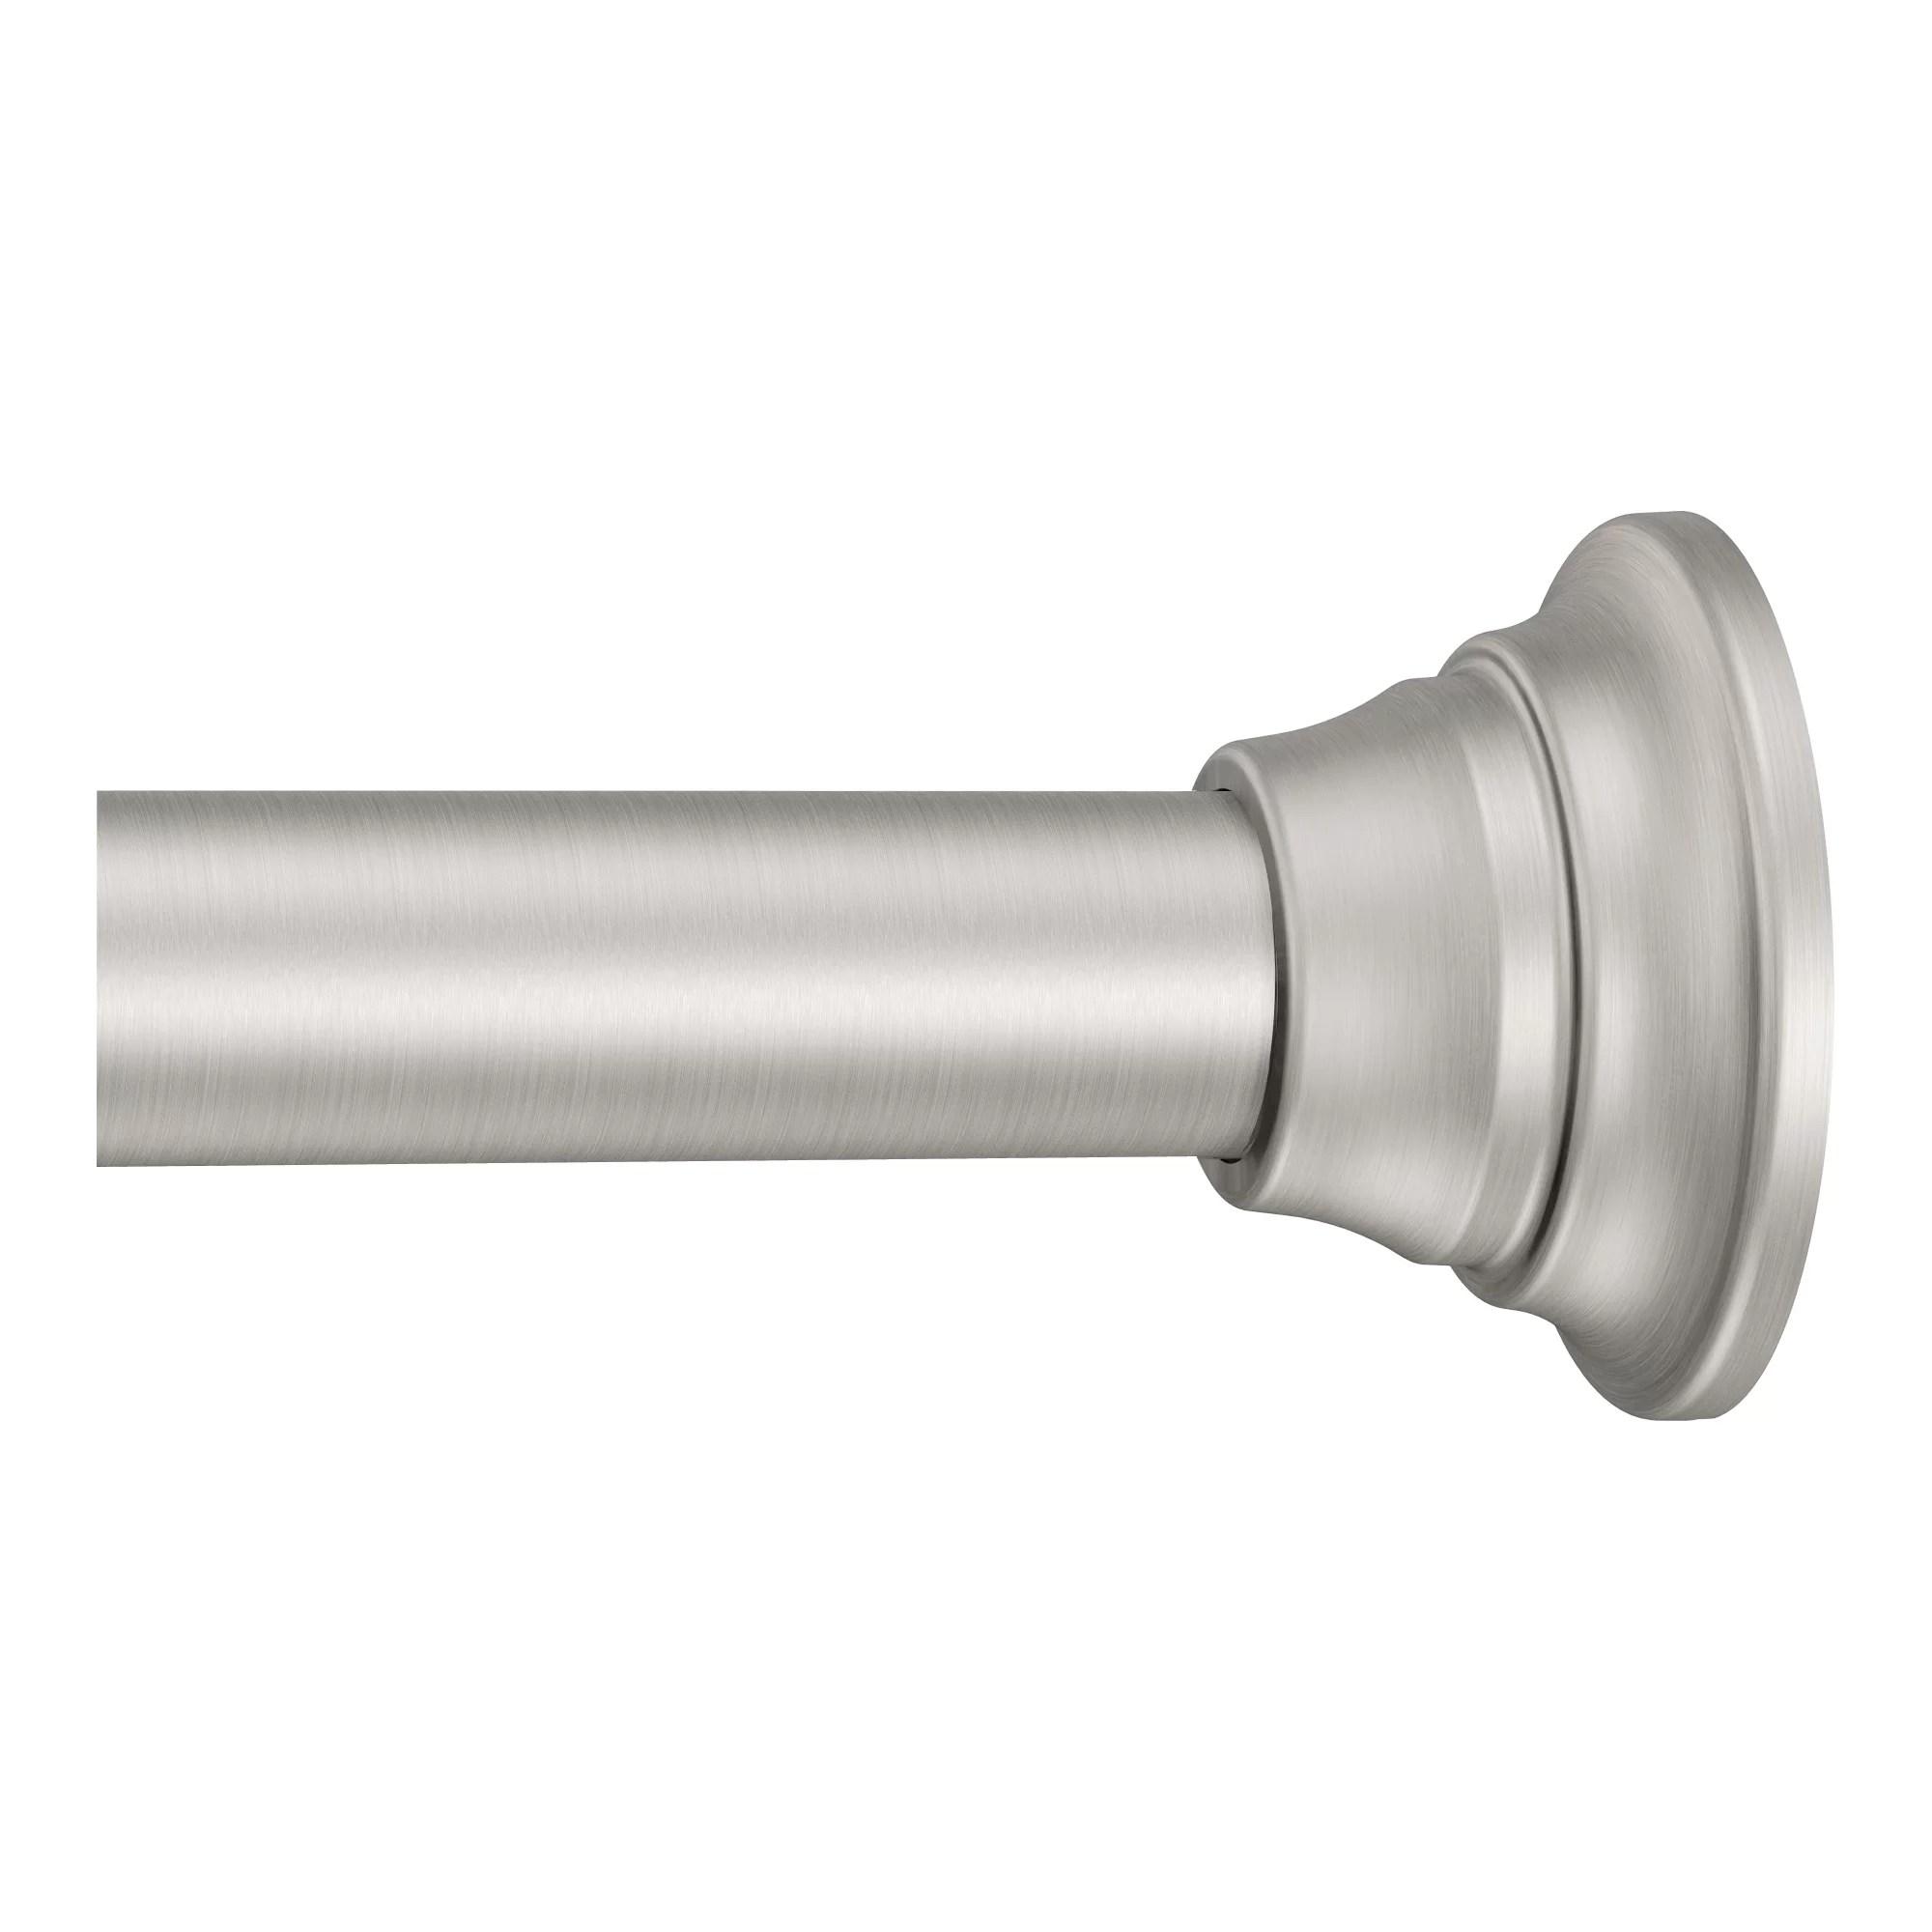 72 adjustable straight tension shower curtain rod